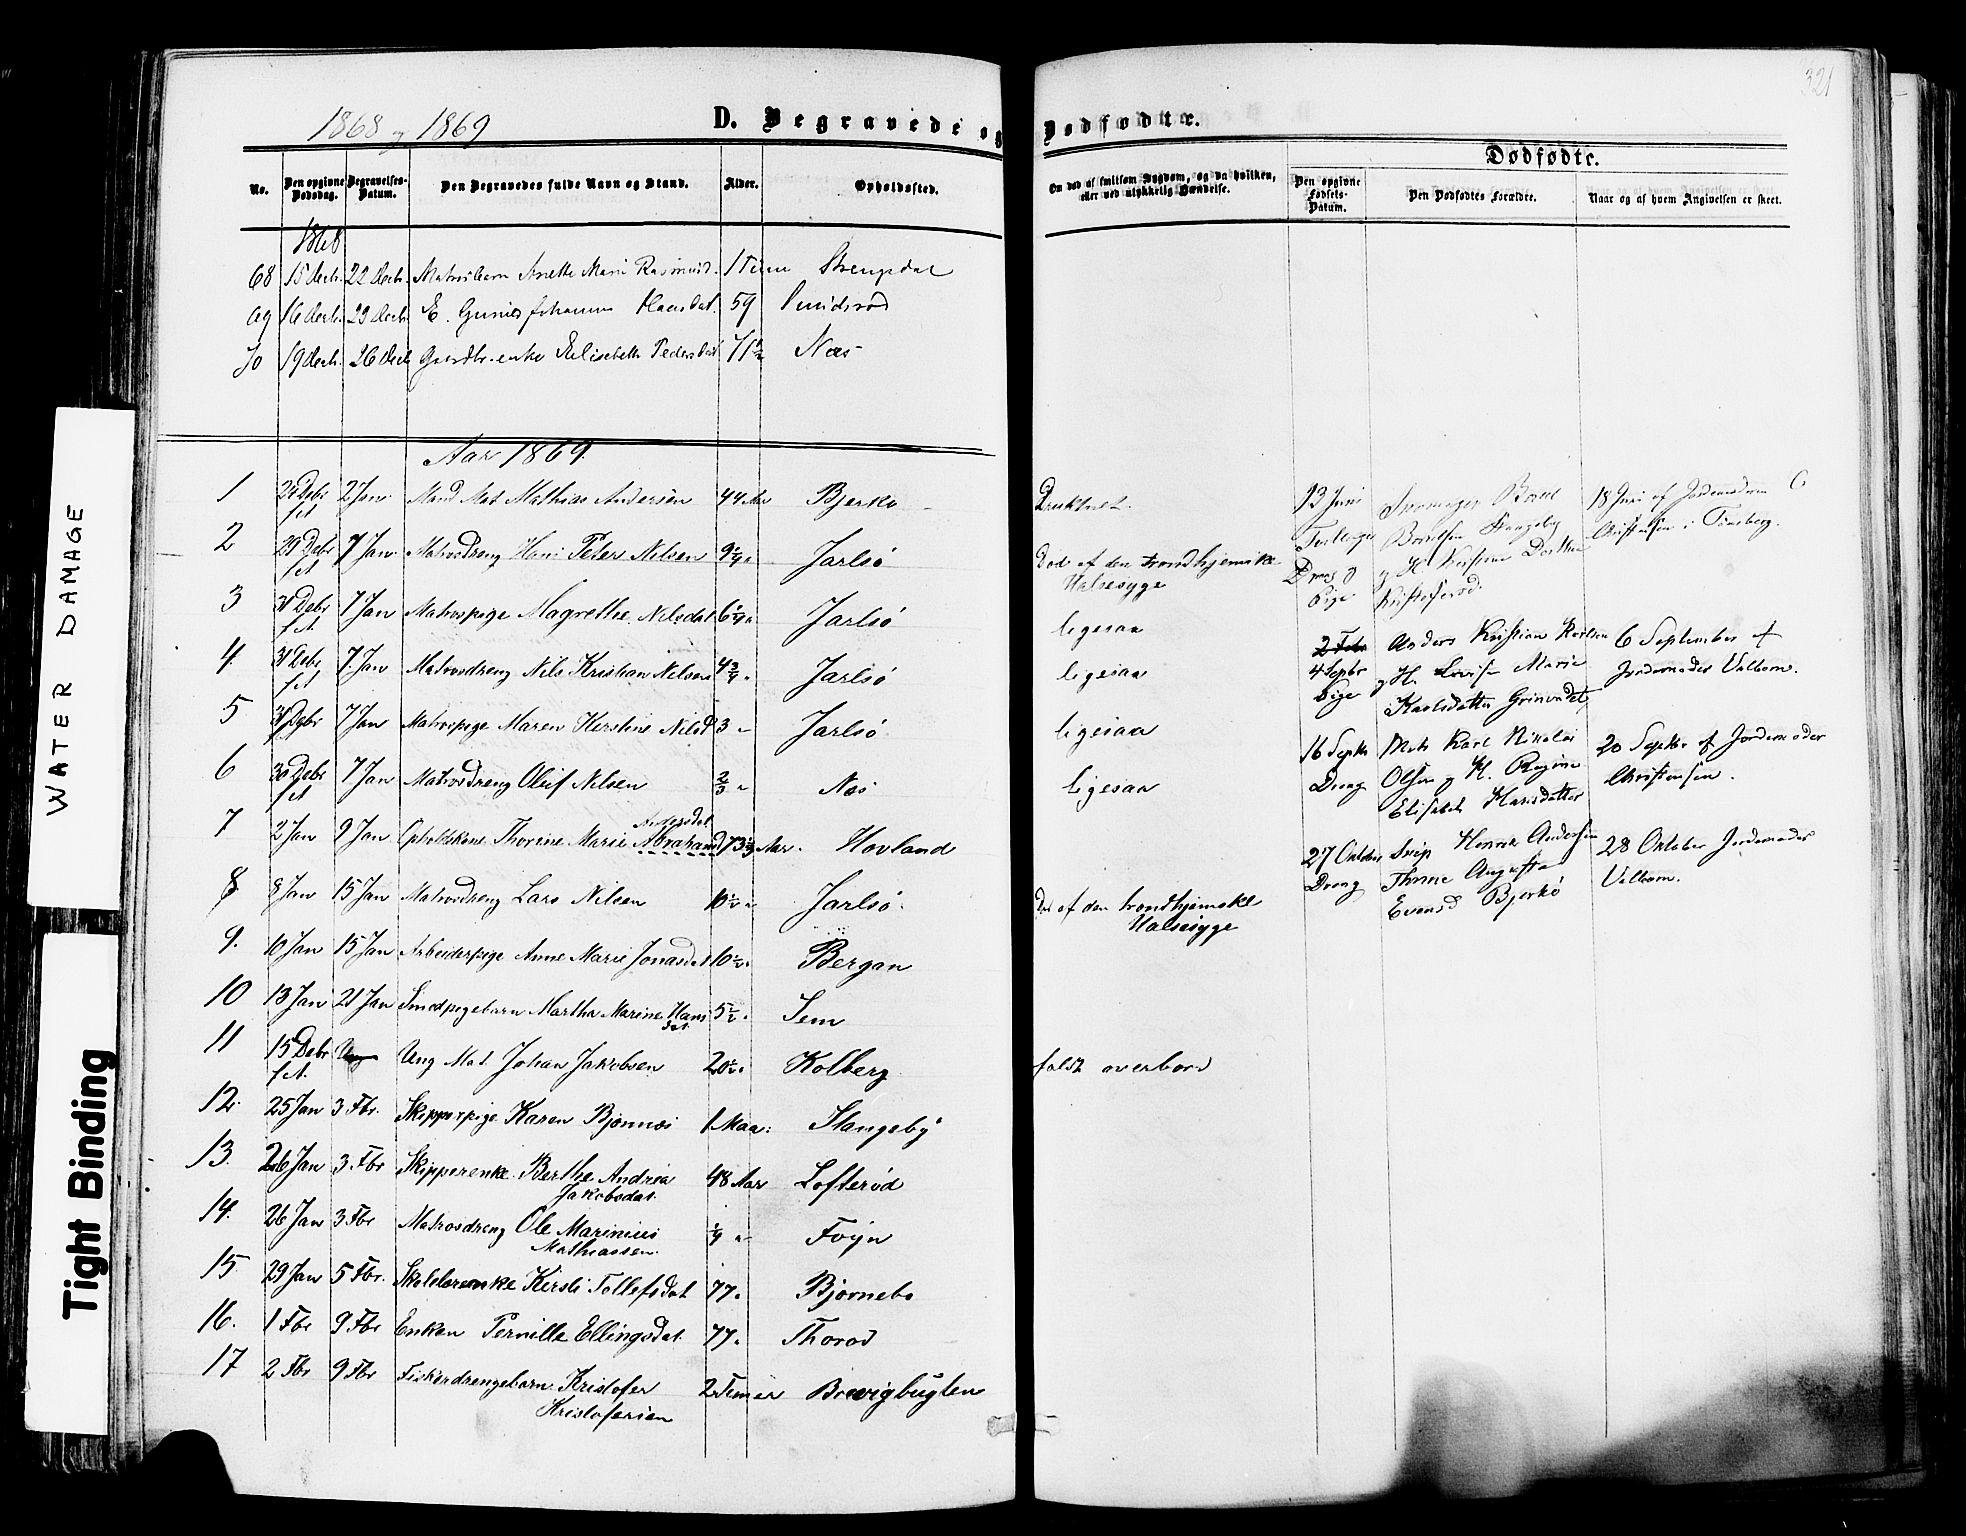 SAKO, Nøtterøy kirkebøker, F/Fa/L0007: Ministerialbok nr. I 7, 1865-1877, s. 321